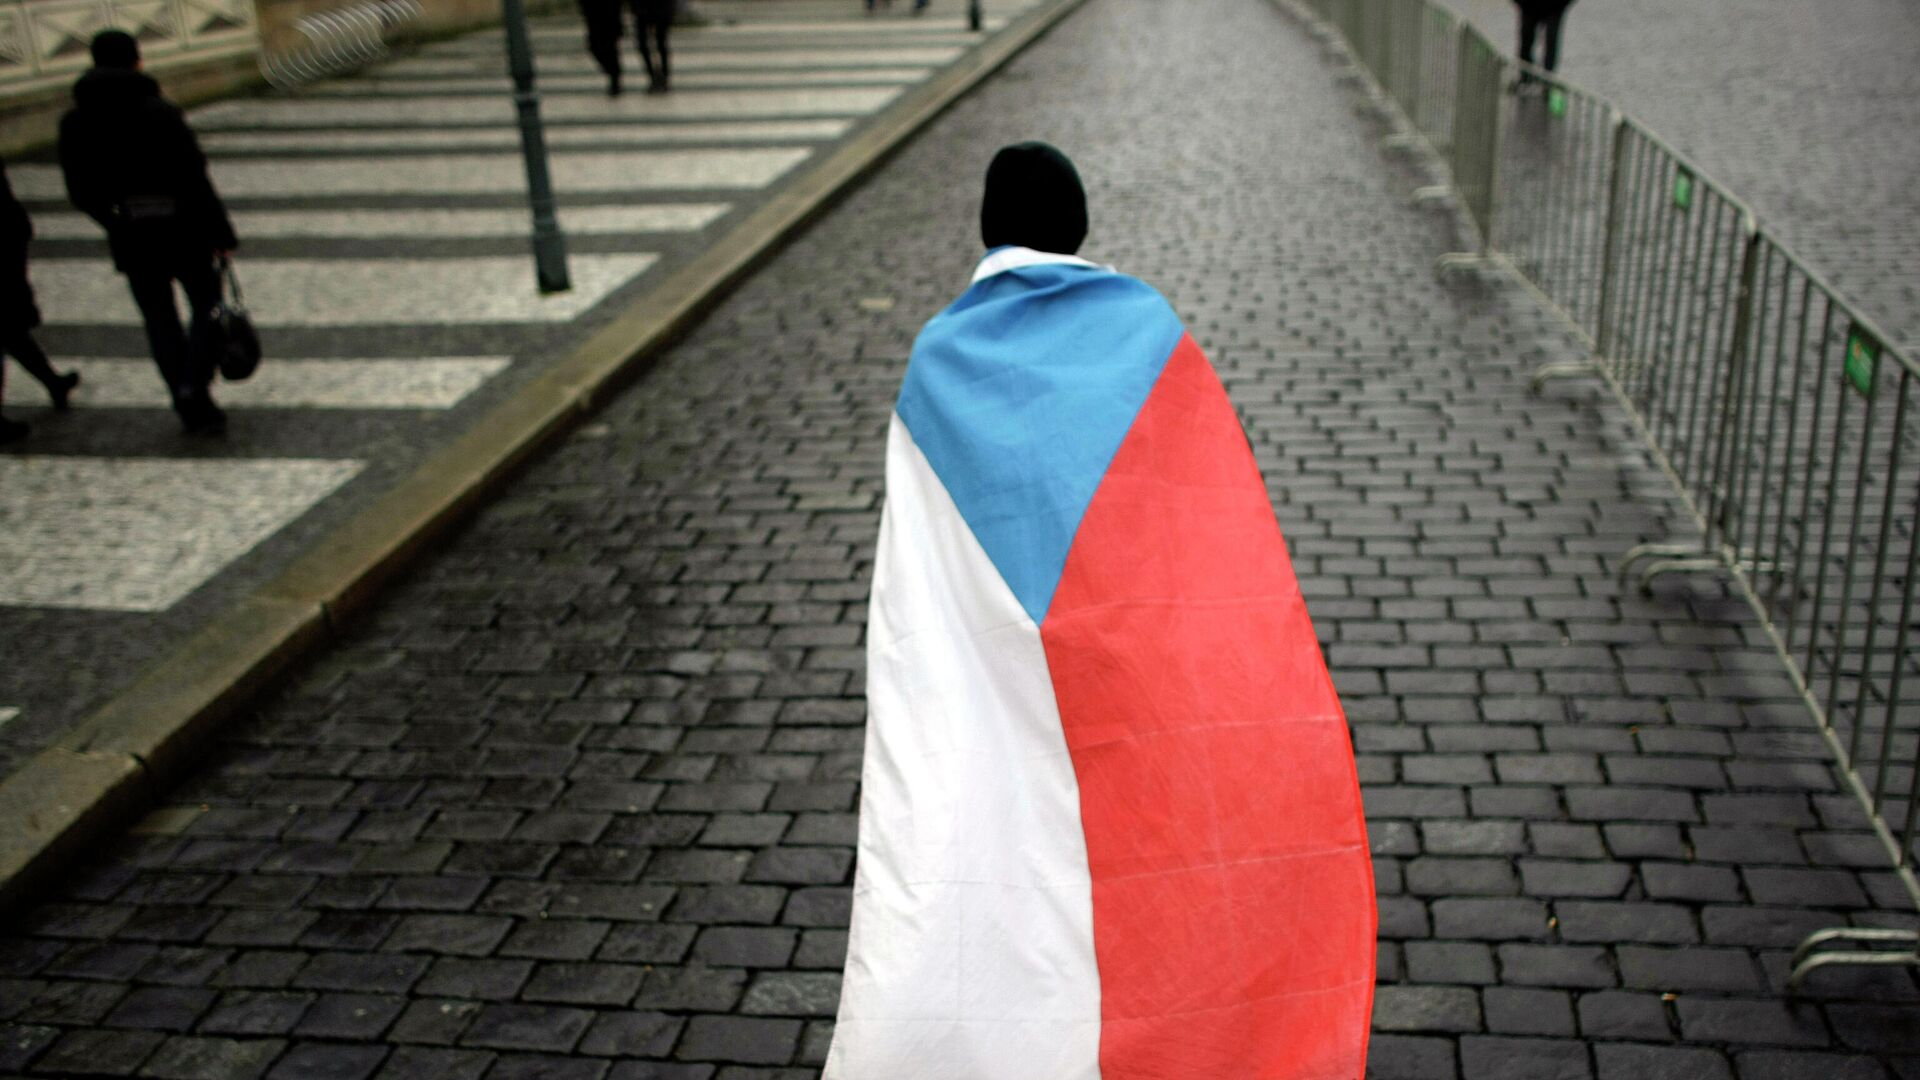 Мужчина с государственным флагом на улице Праги - РИА Новости, 1920, 09.10.2021